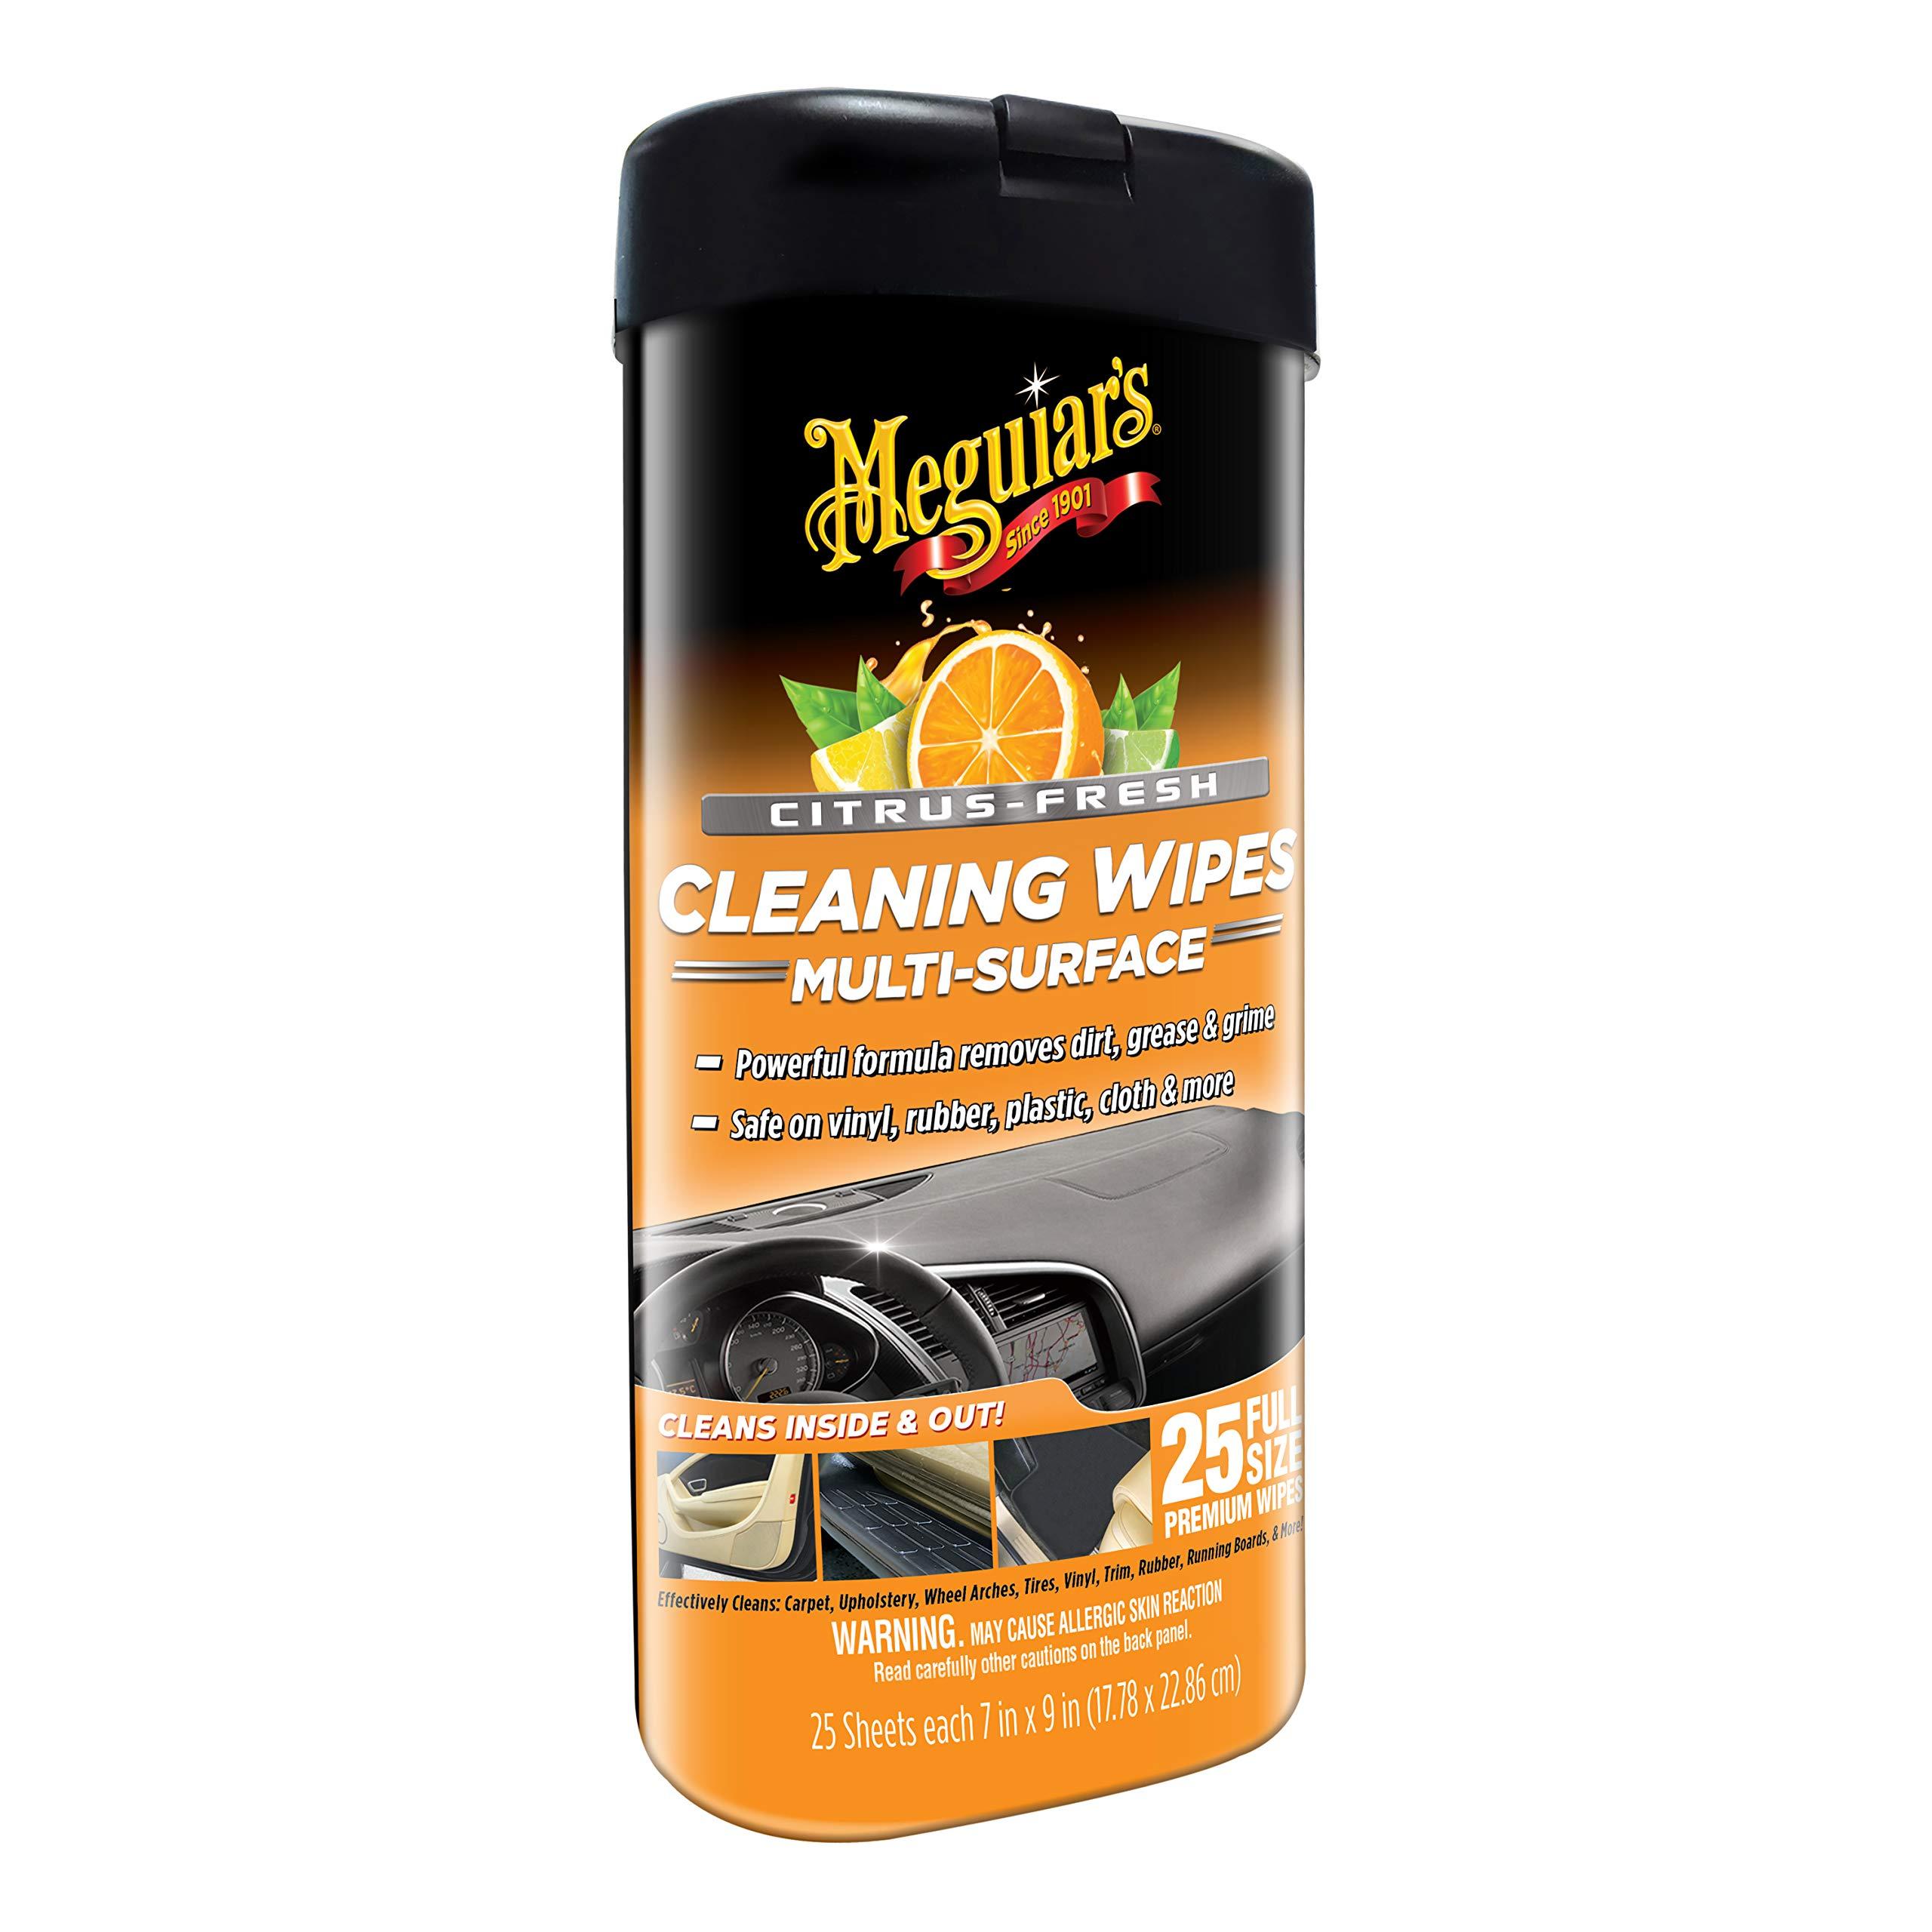 MEGUIAR'S G190600 Citrus-Fresh Cleaning Wipes, 25 Count